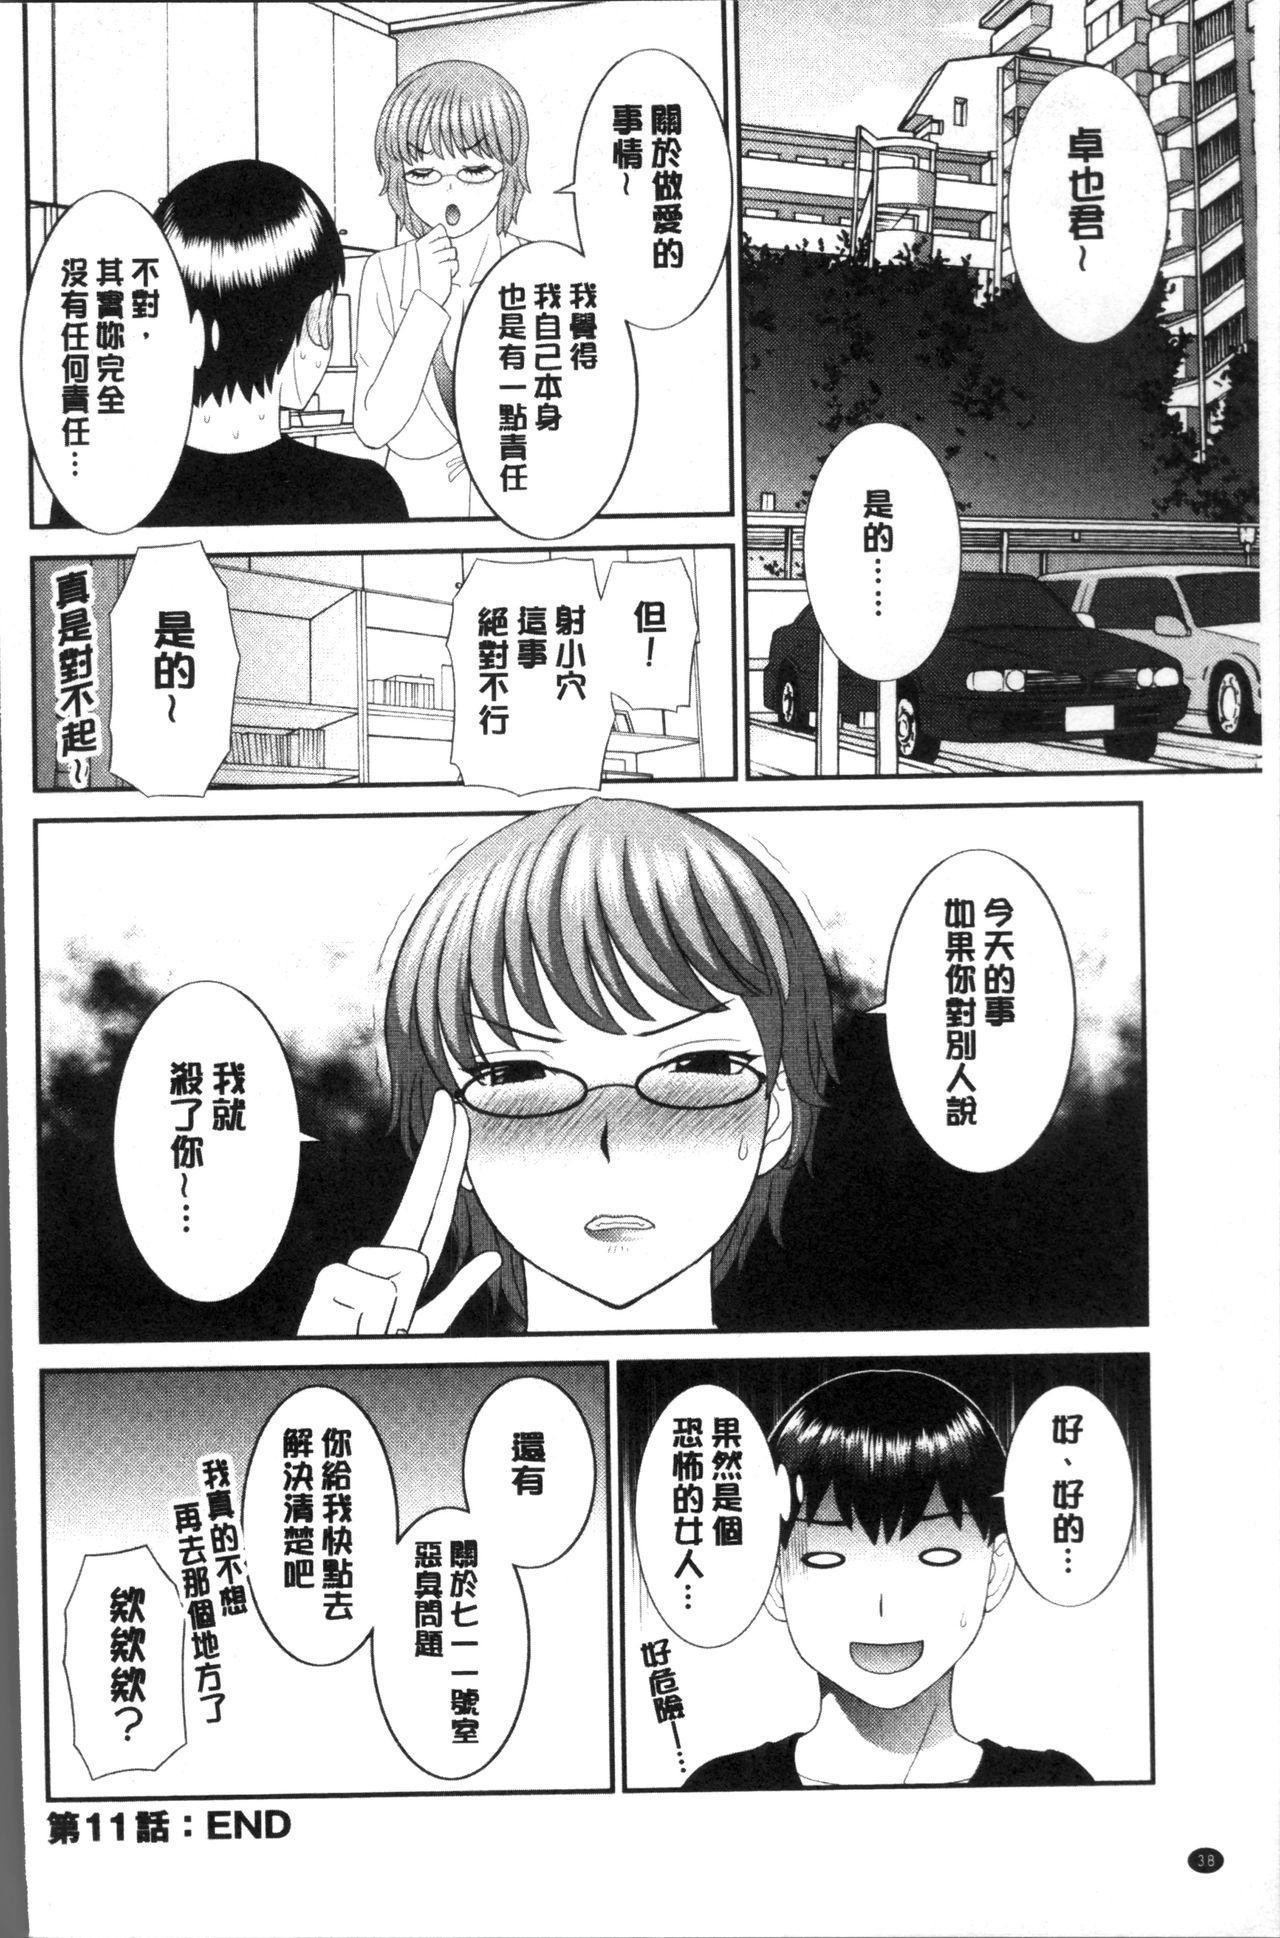 [Kawamori Misaki] Innyuu Shufu no Futei Ganbou - Oku-san to Kanojo to 2 | 淫乳主婦的不貞願望 和人妻也和女友❤2 [Chinese] 41